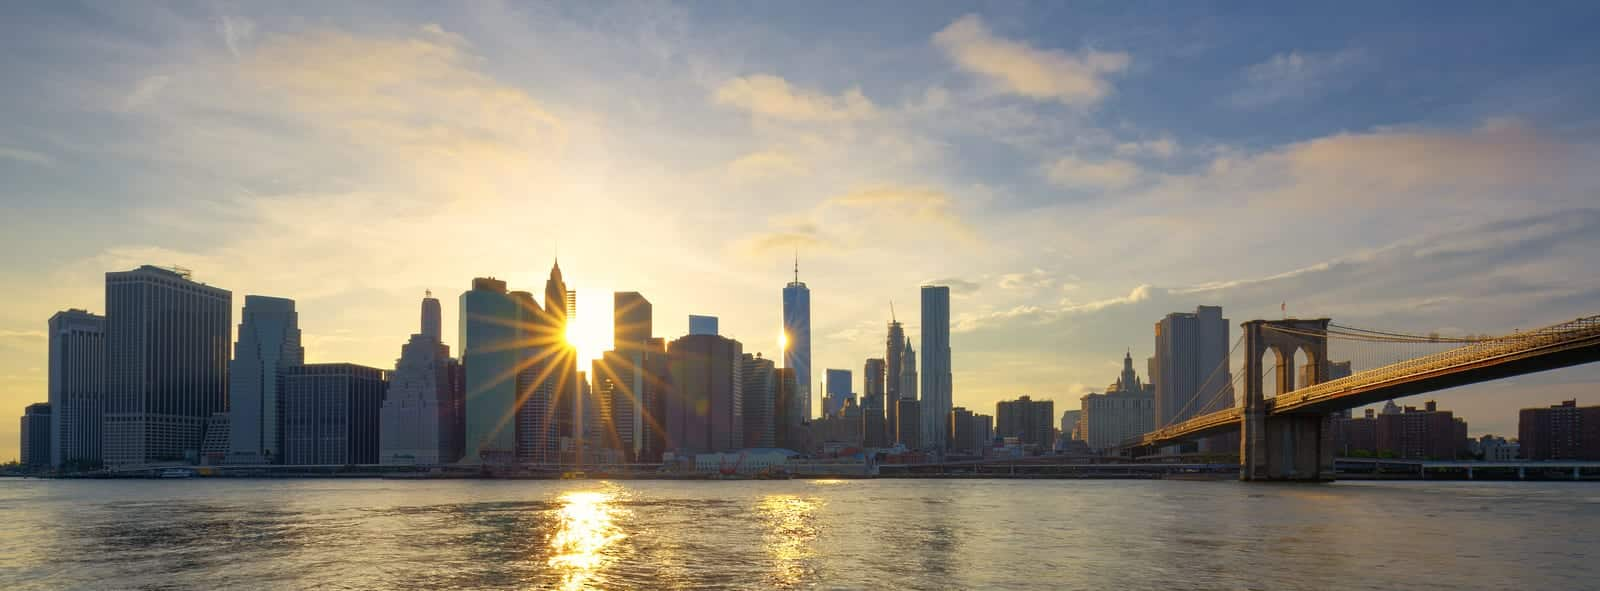 Five Points (historic) Manhattan, NY Private Investigator